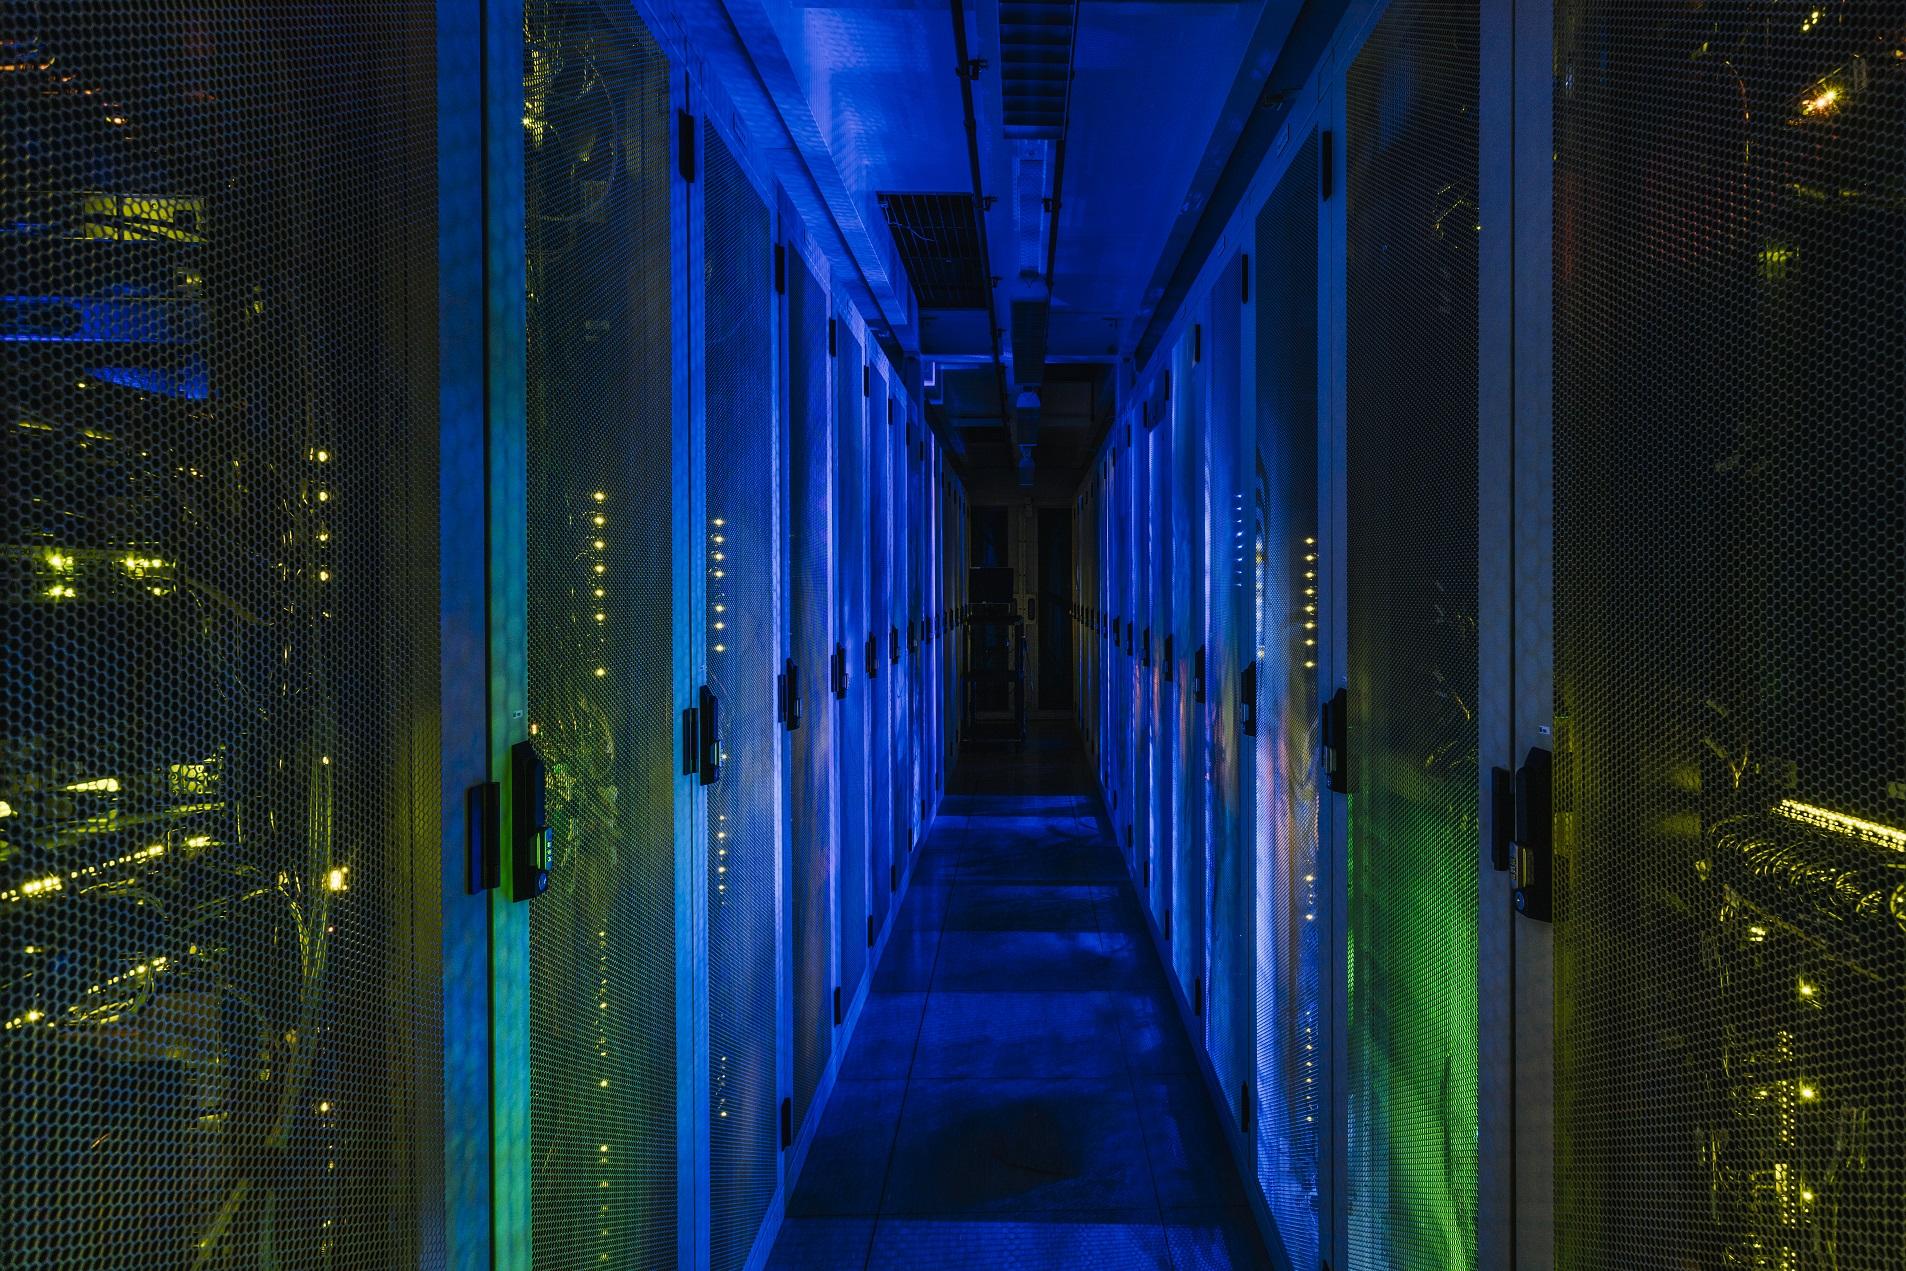 ams-1-data-center-cabinet-row-lit-2